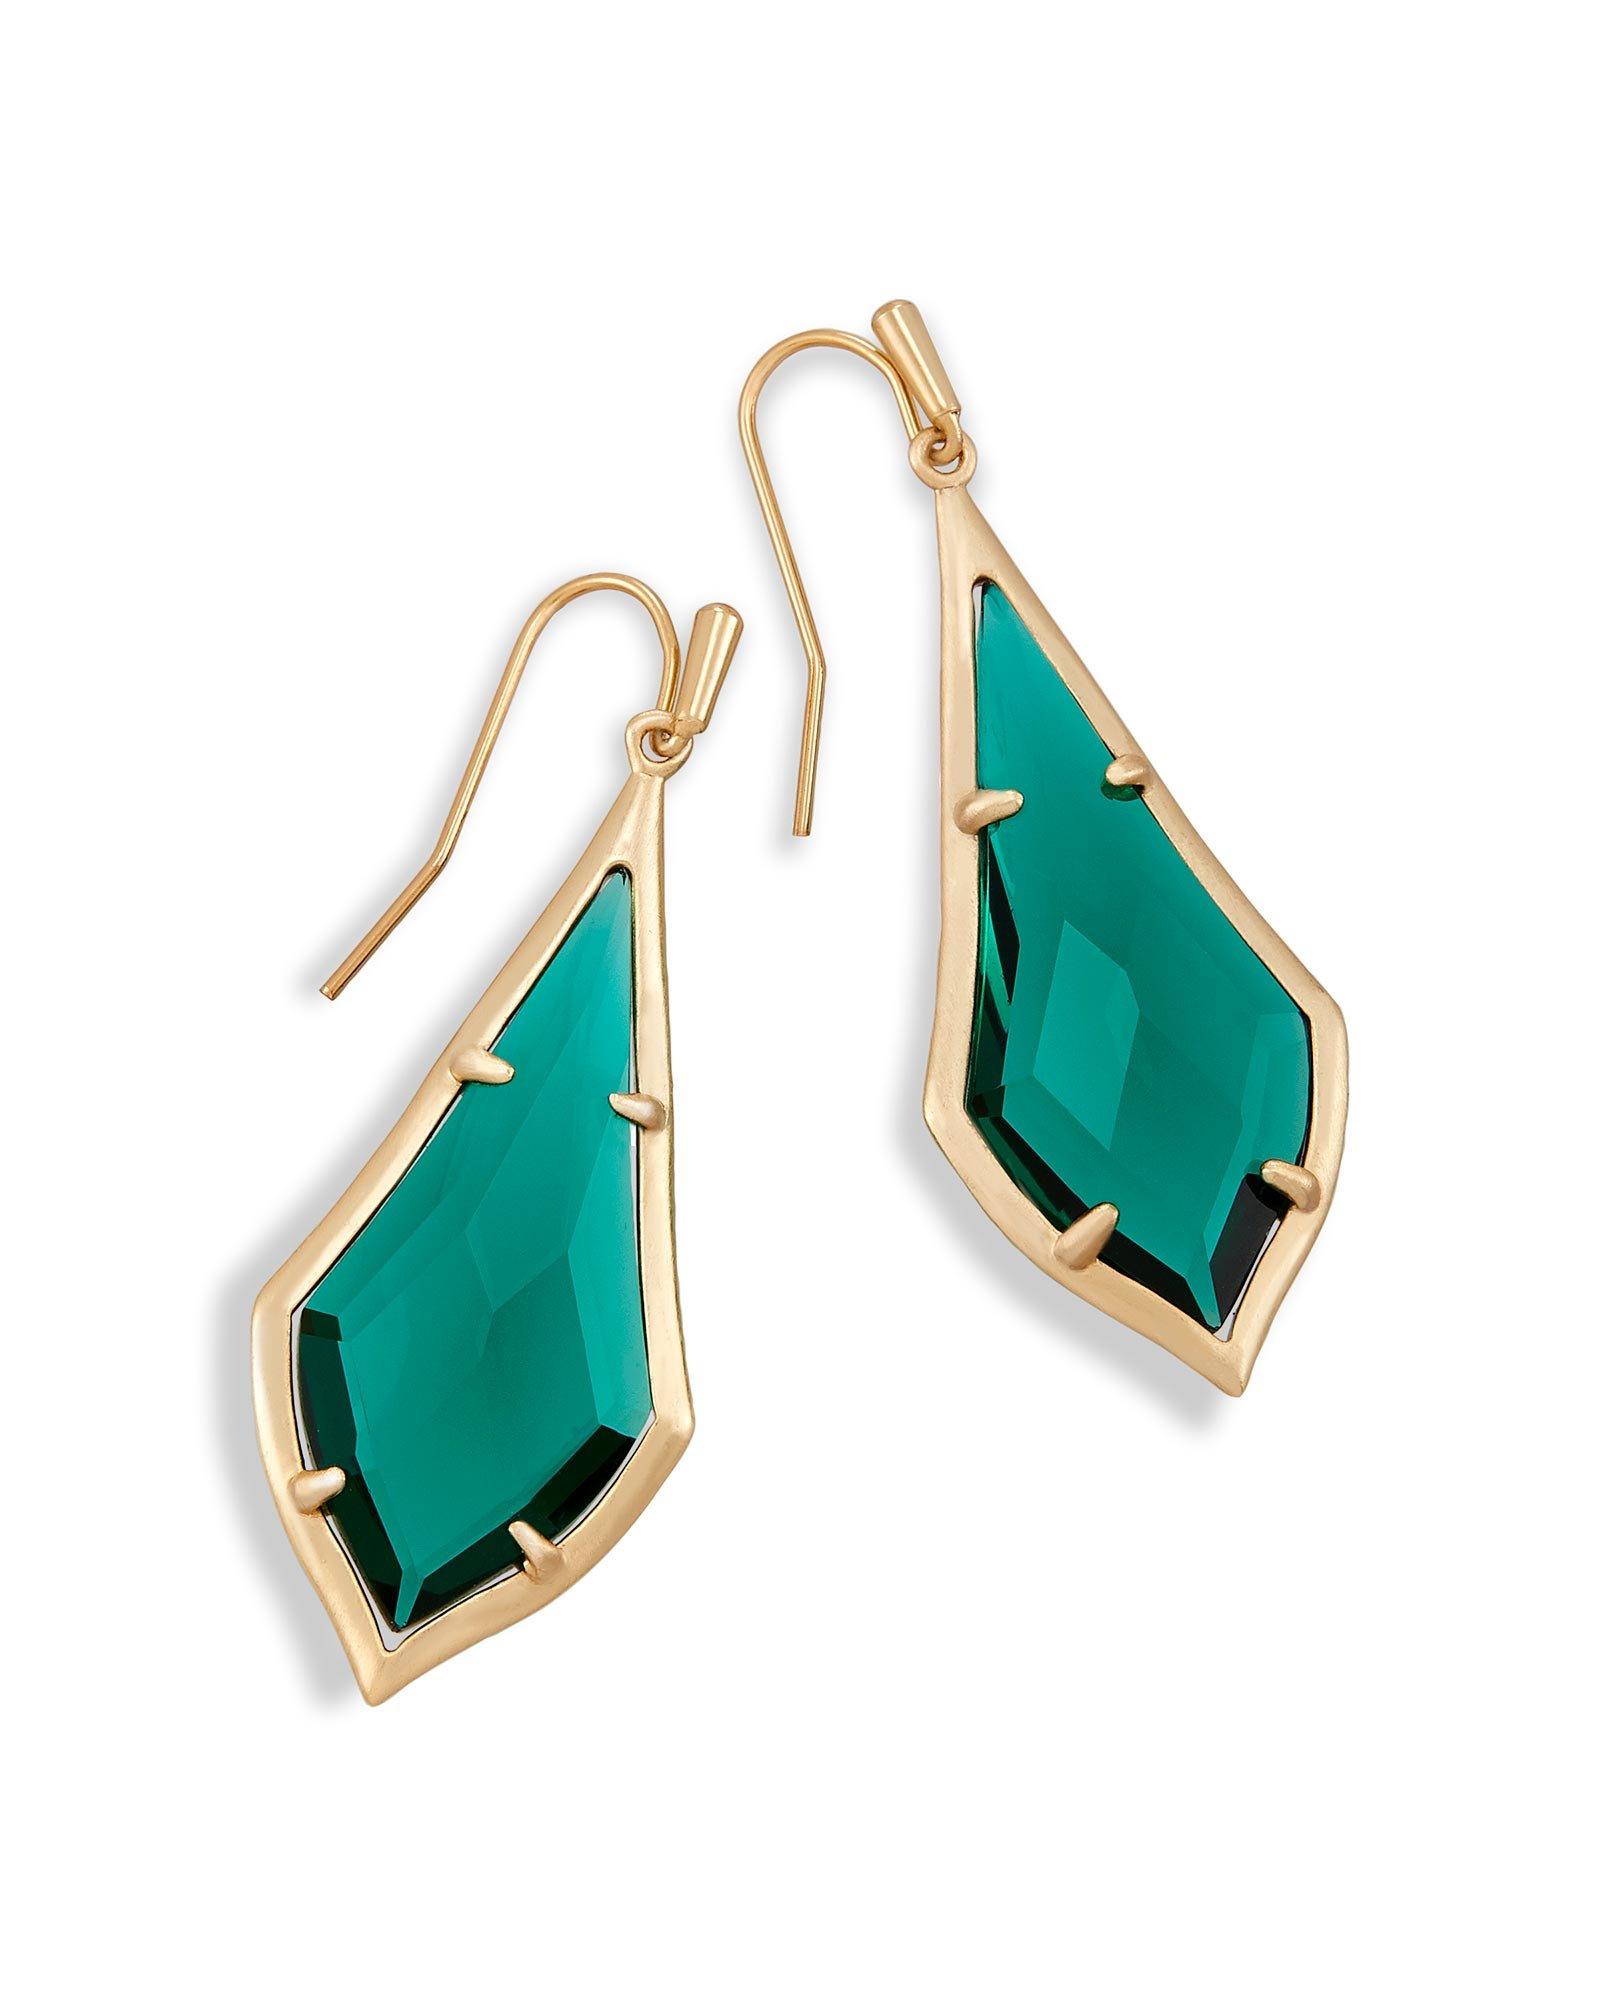 Kendra Scott Signature Olivia Drop Earrings In Emerald Glass